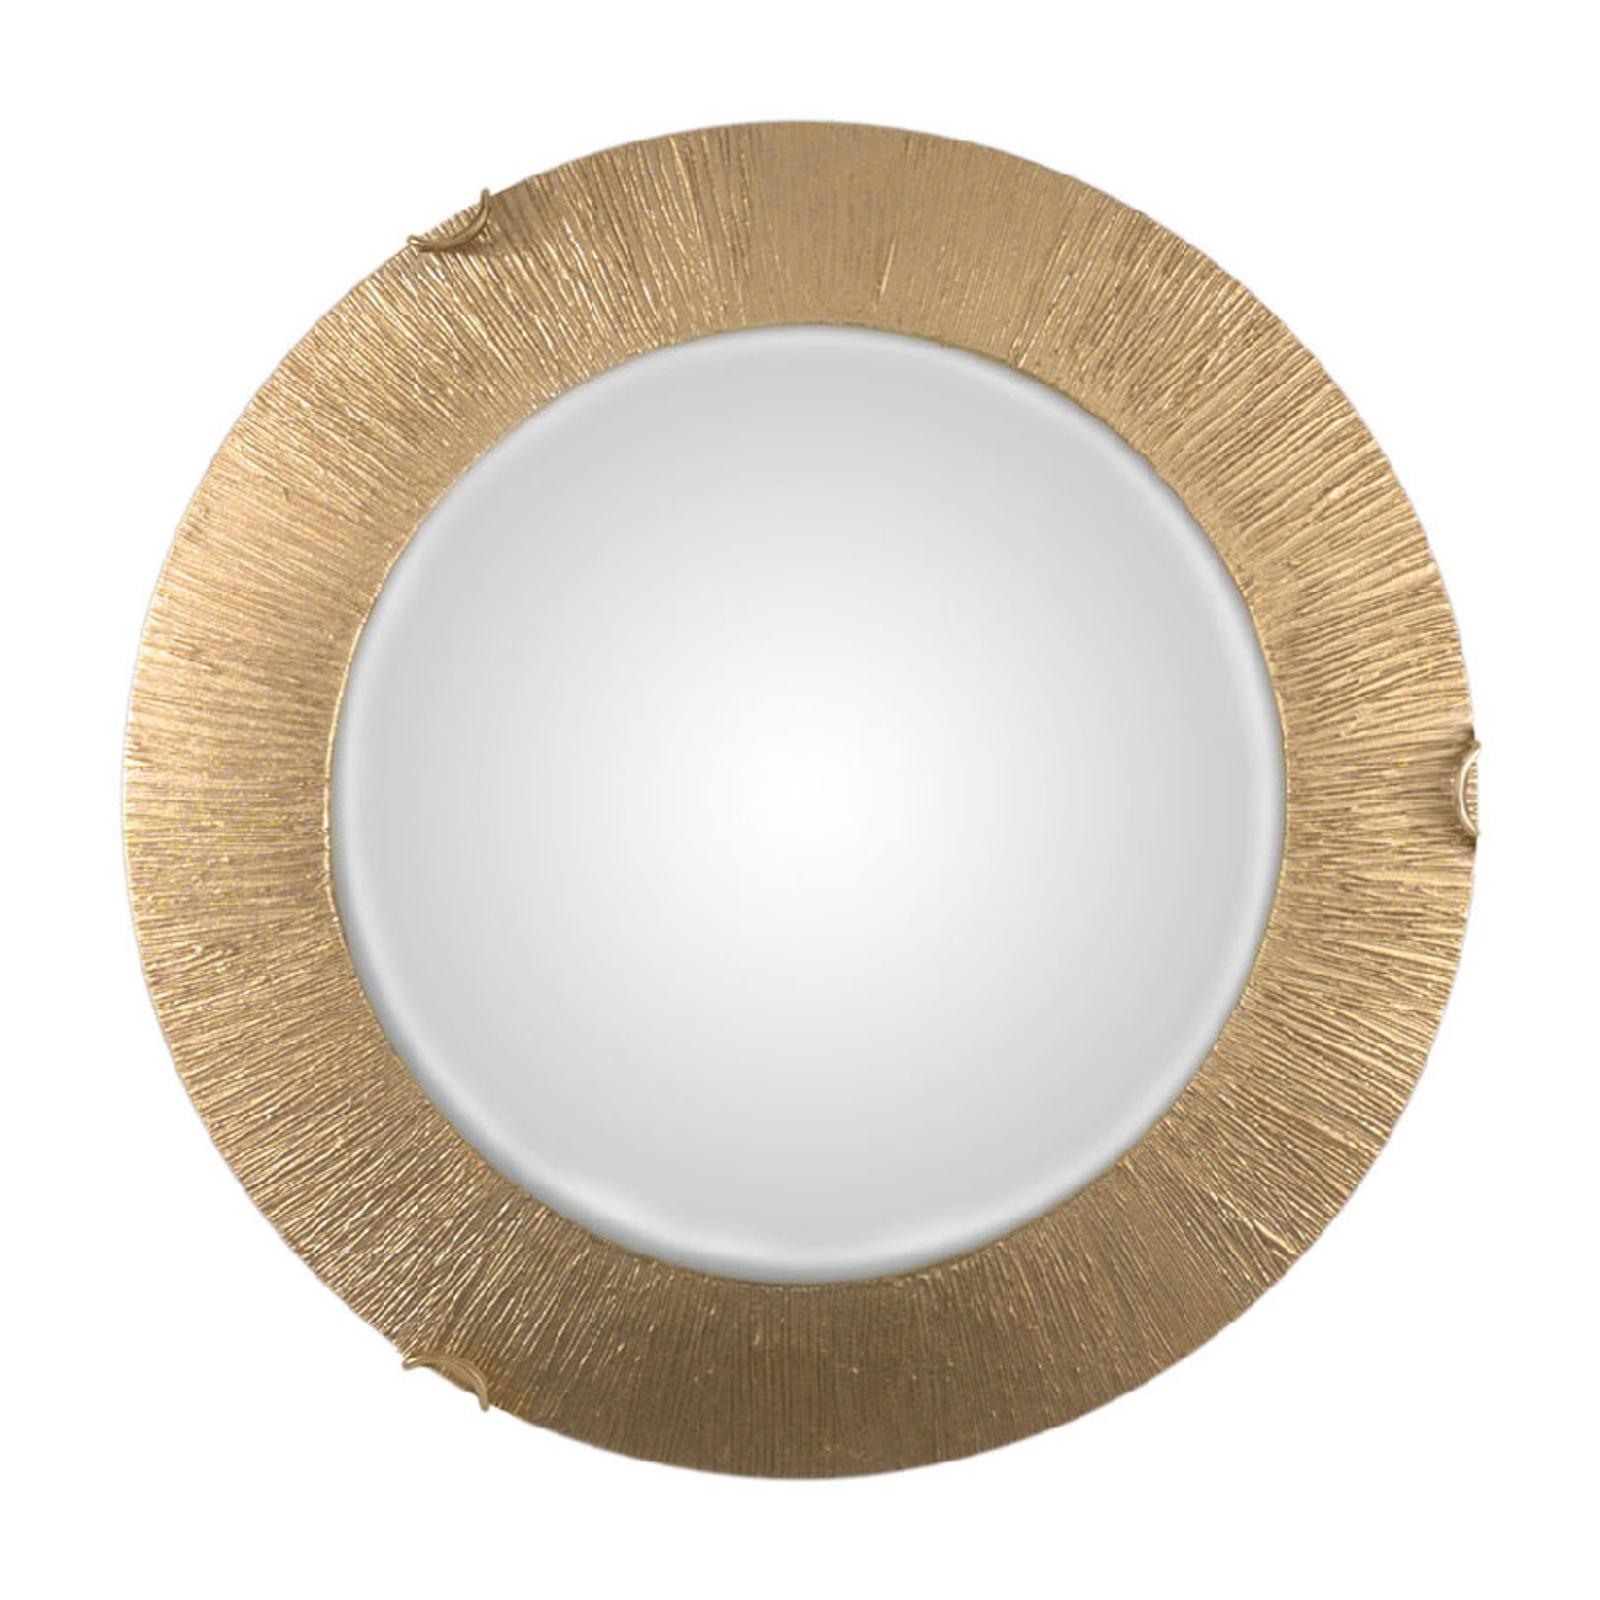 Lampa sufitowa Moon Sun, złota, Ø 40 cm